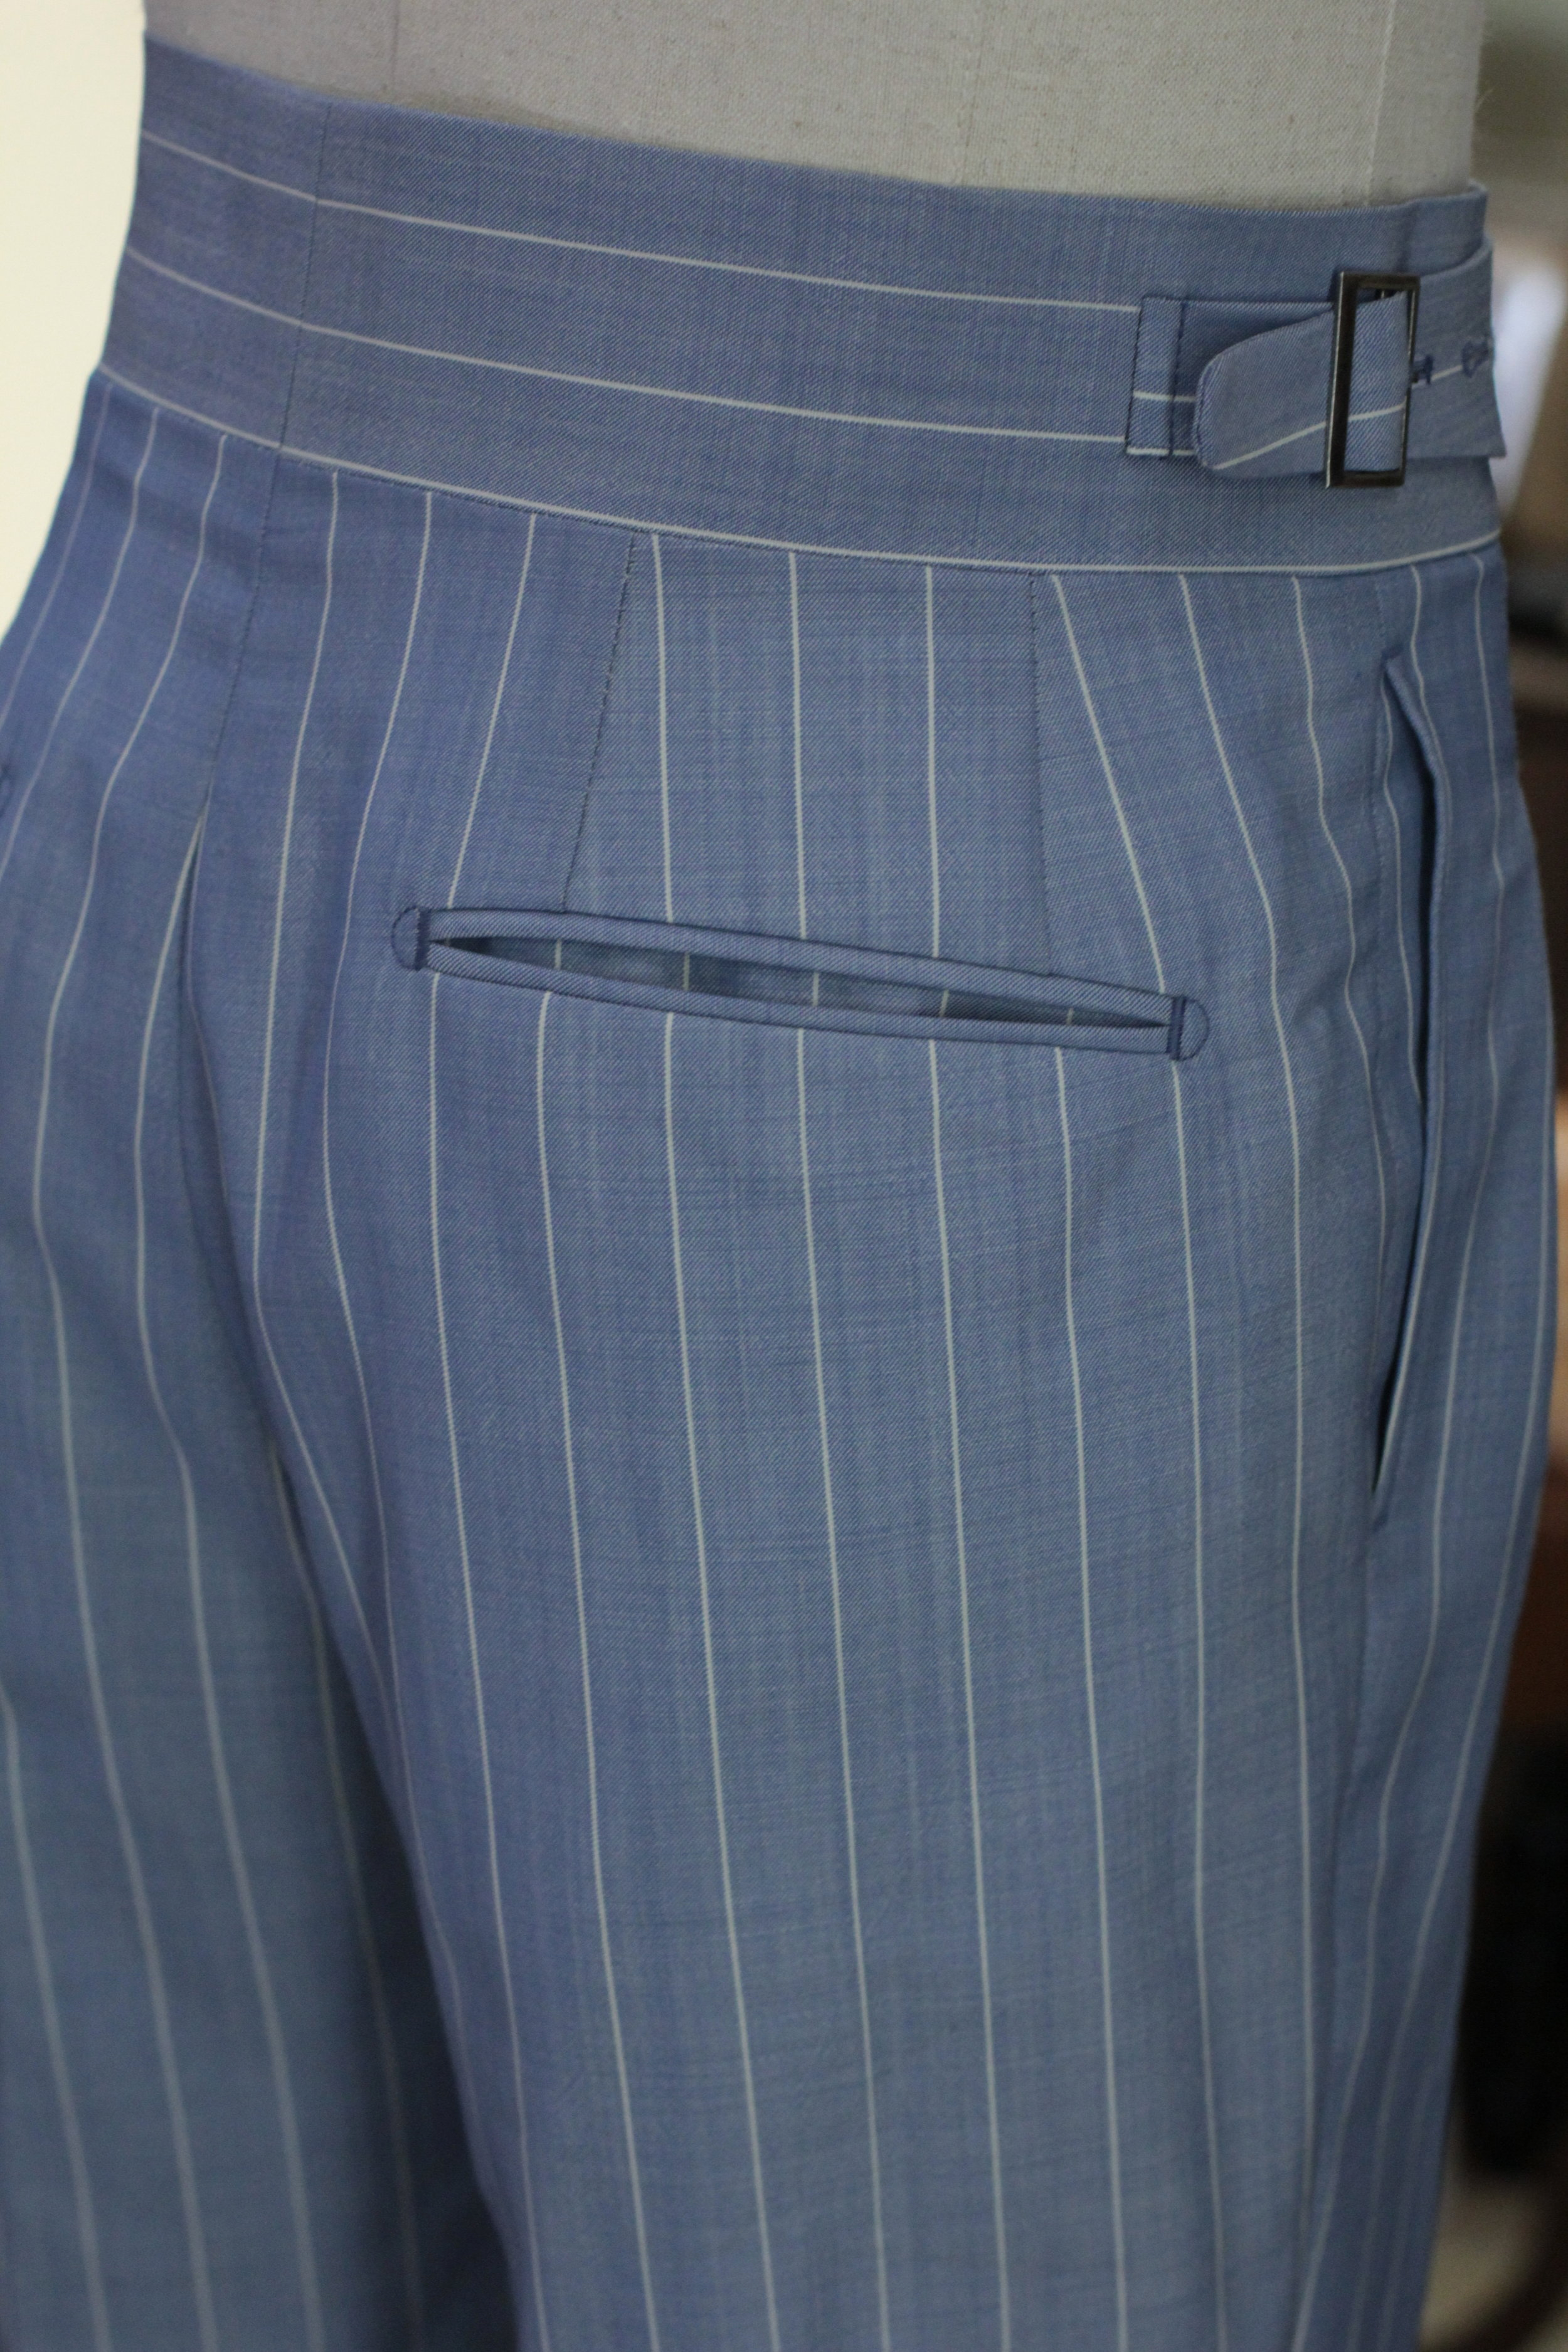 Back Pocket Made Suits Made to measure Gurkha Trousers Bespoke Pinstripe light blue English Mohair Holland & Sherry.JPG